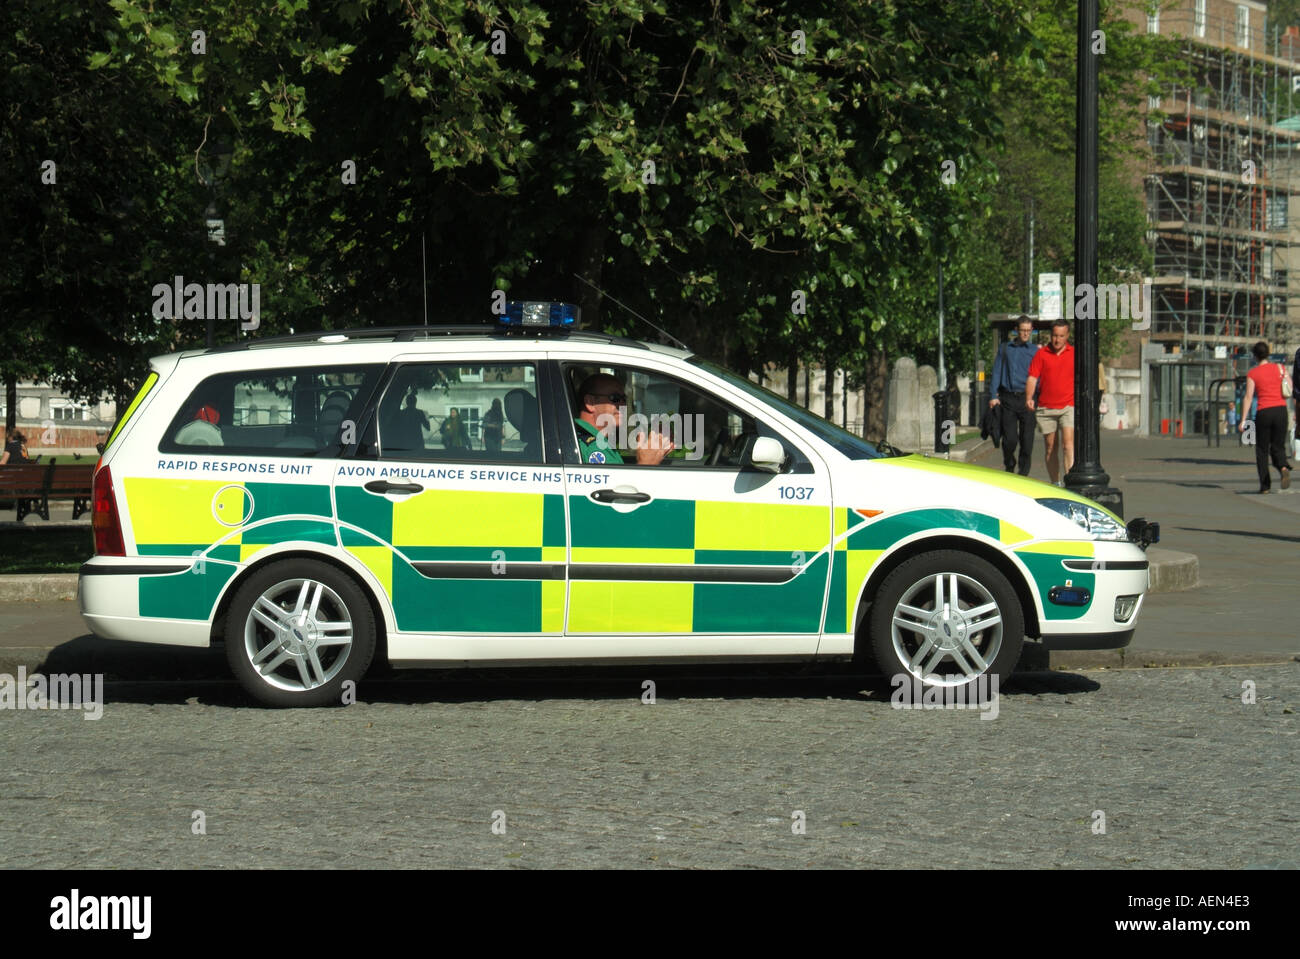 Car Insurance For Ambulance Staff